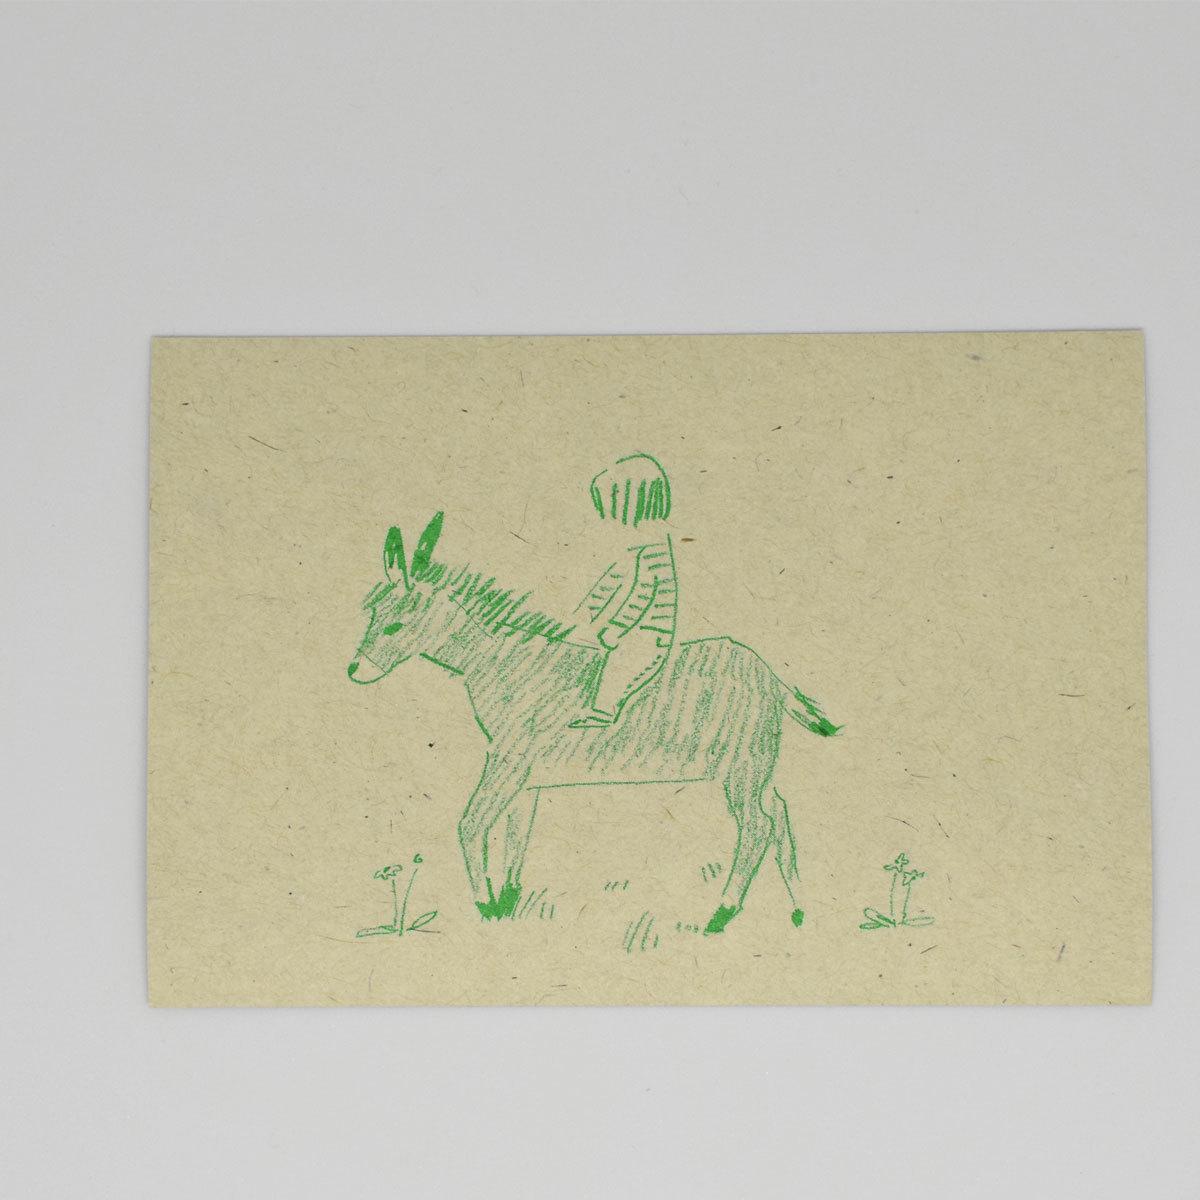 HIGASHI ALPS(ヒガシアルプス)ポストカード ロバと少年